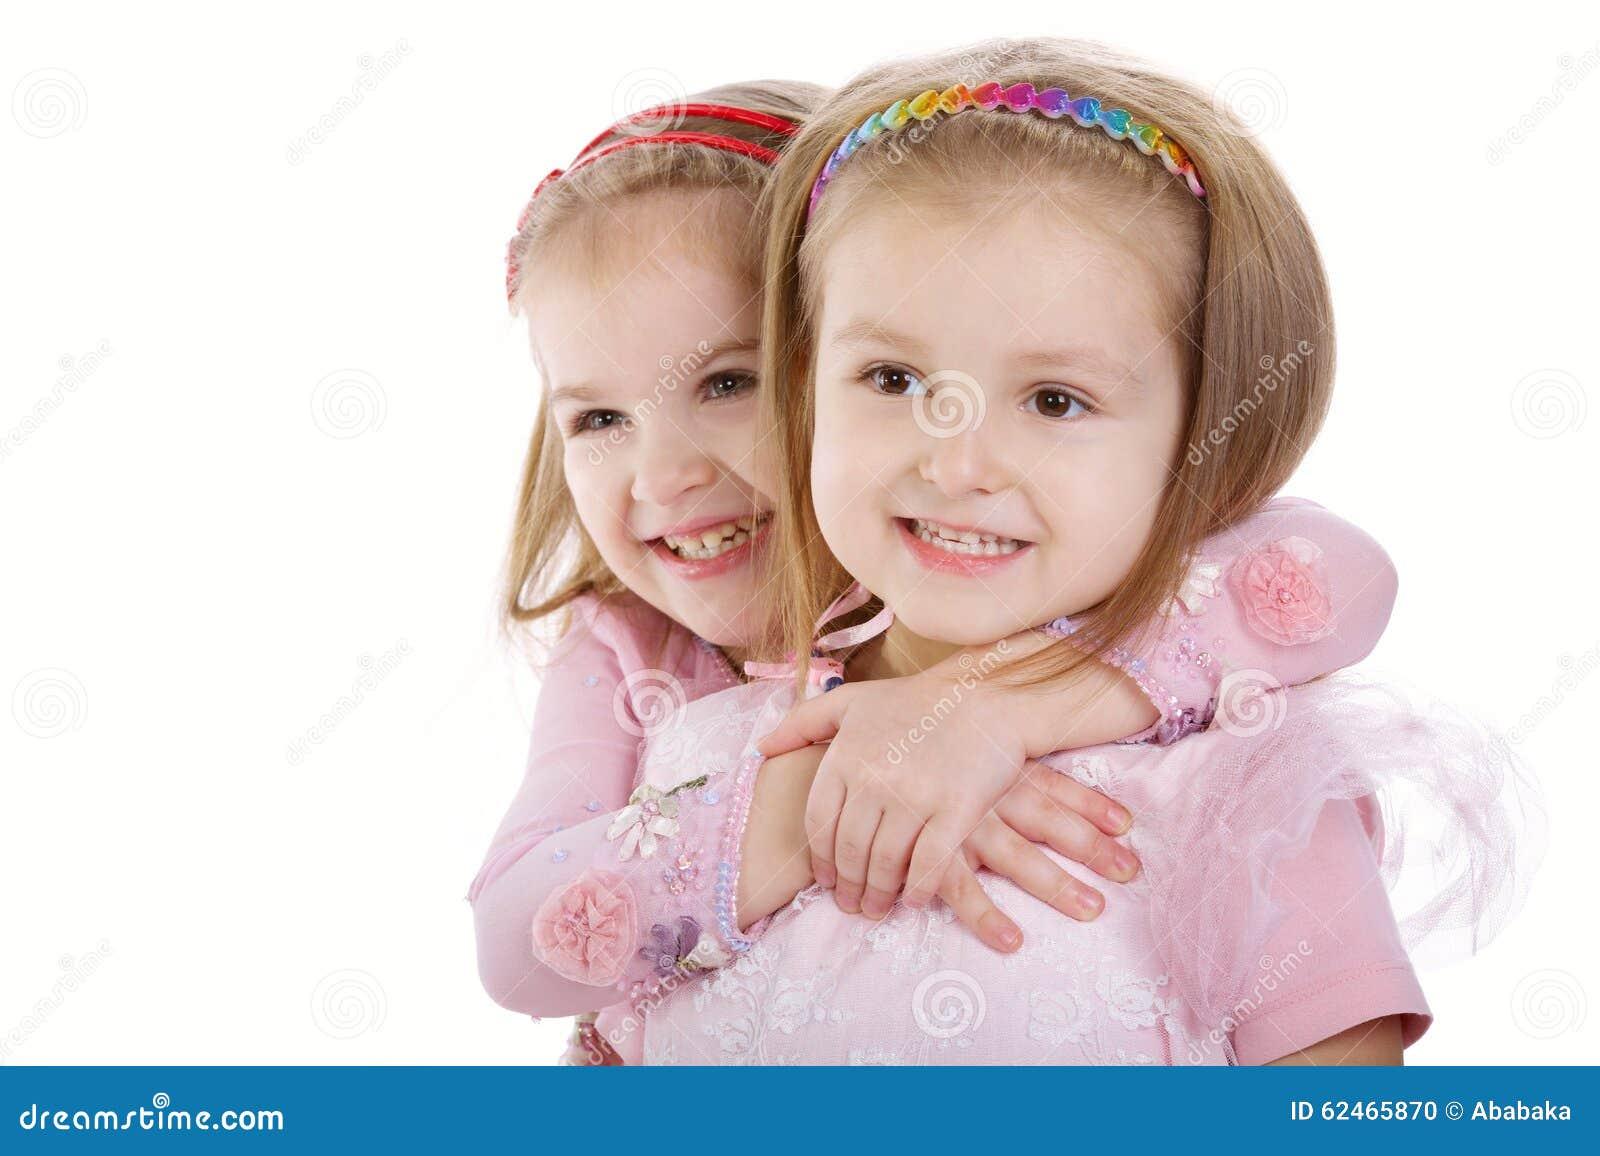 The best little girl in the world movie watch online